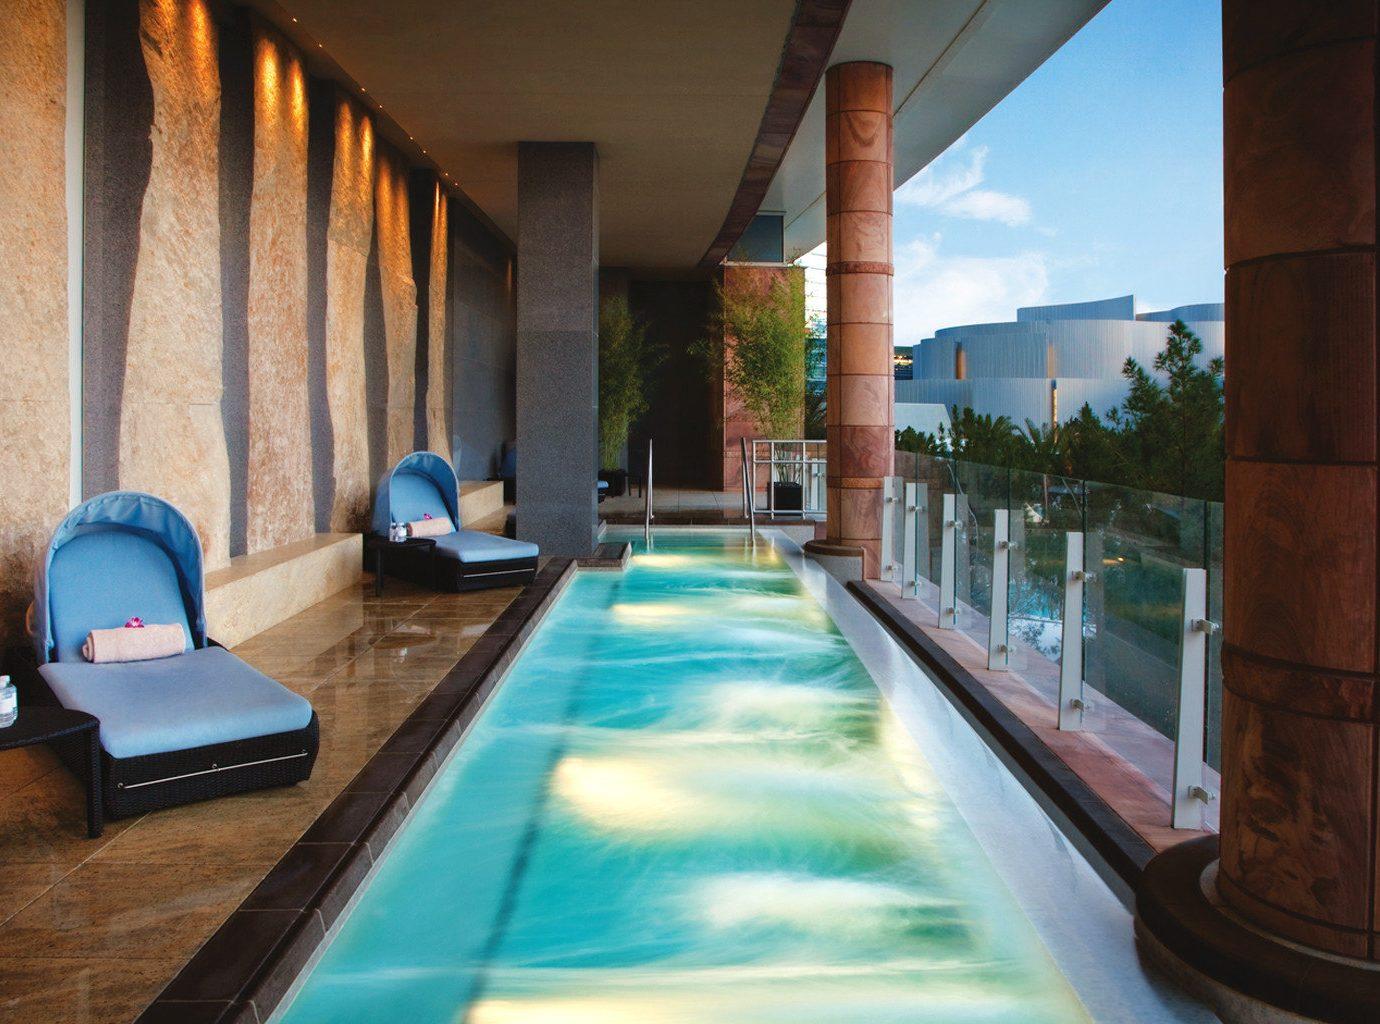 Hotels Living Lounge Luxury Modern Pool Romance Trip Ideas swimming pool leisure property Resort estate vacation condominium interior design Villa mansion furniture